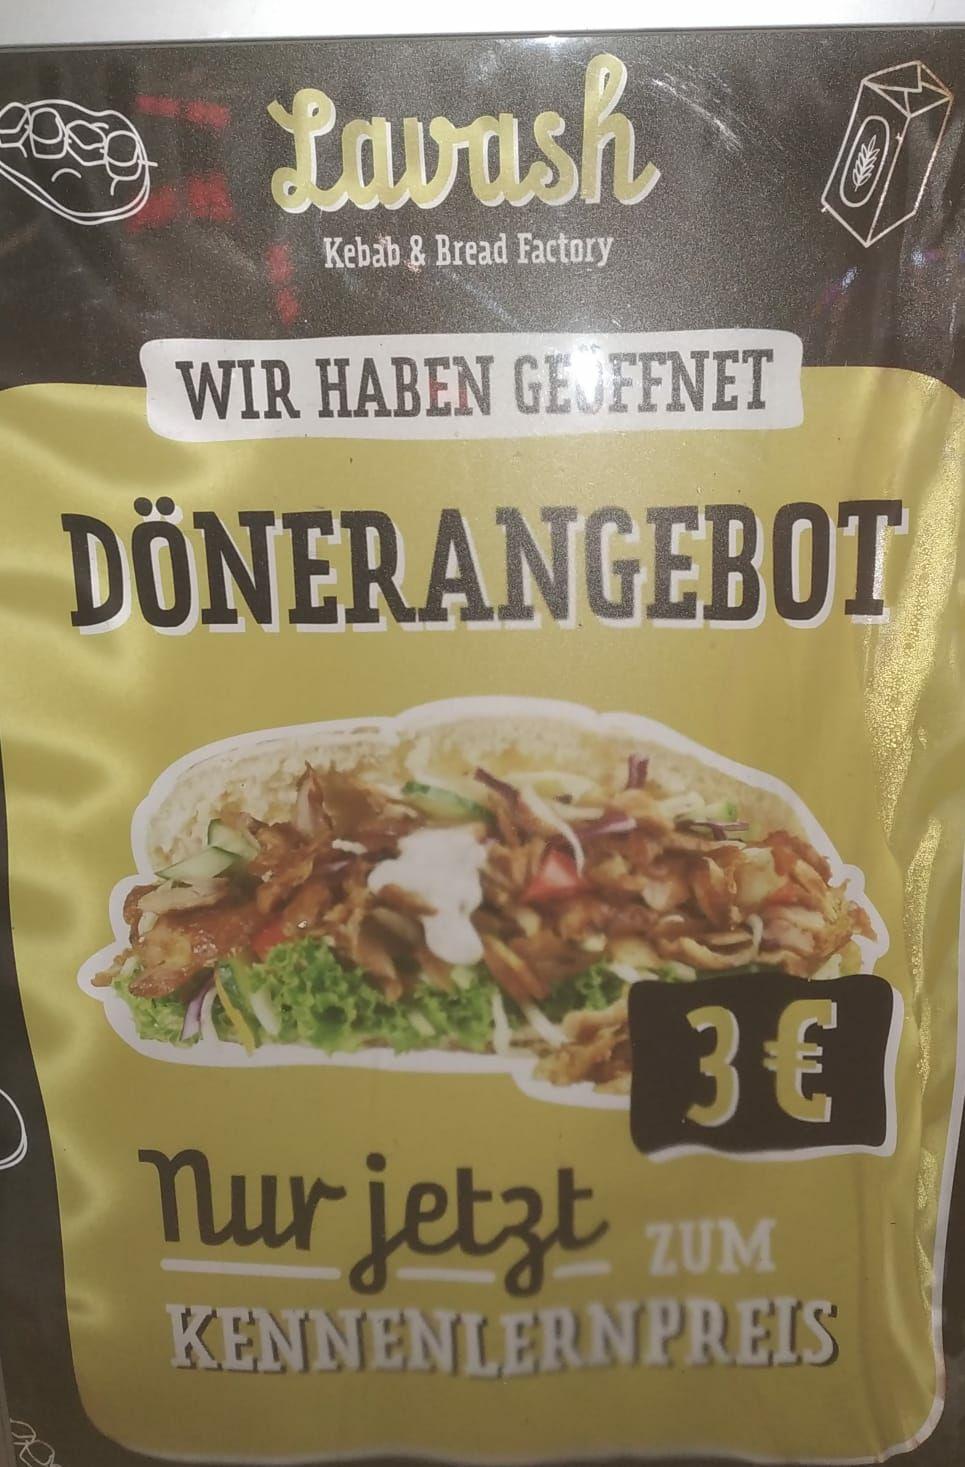 [LOKAL] Döner 3€ Lavash factory Lübeck